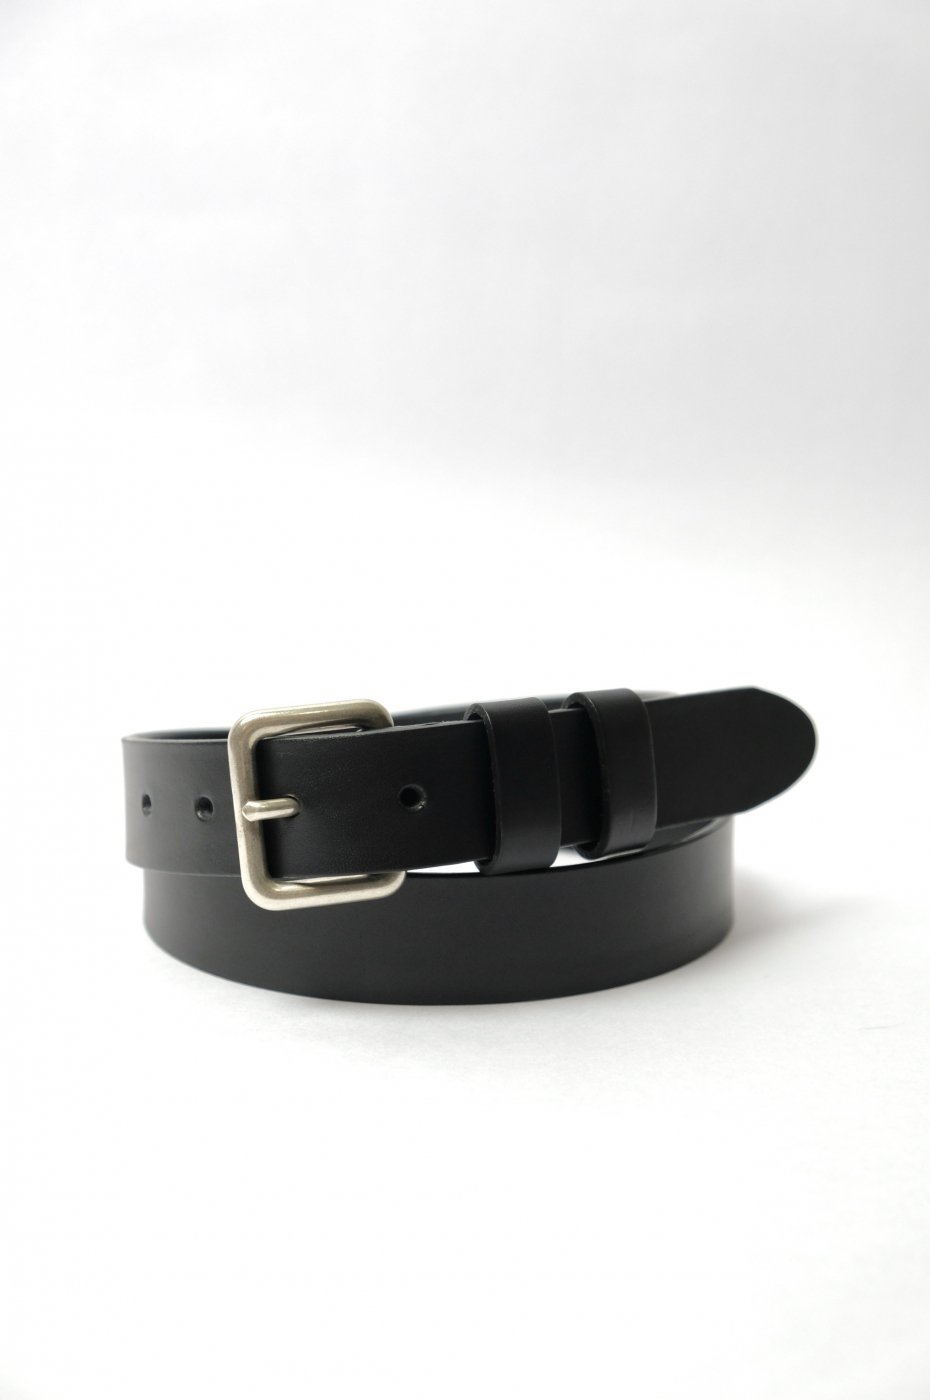 Le Sellier ル・セリエ -BELT-BLACK